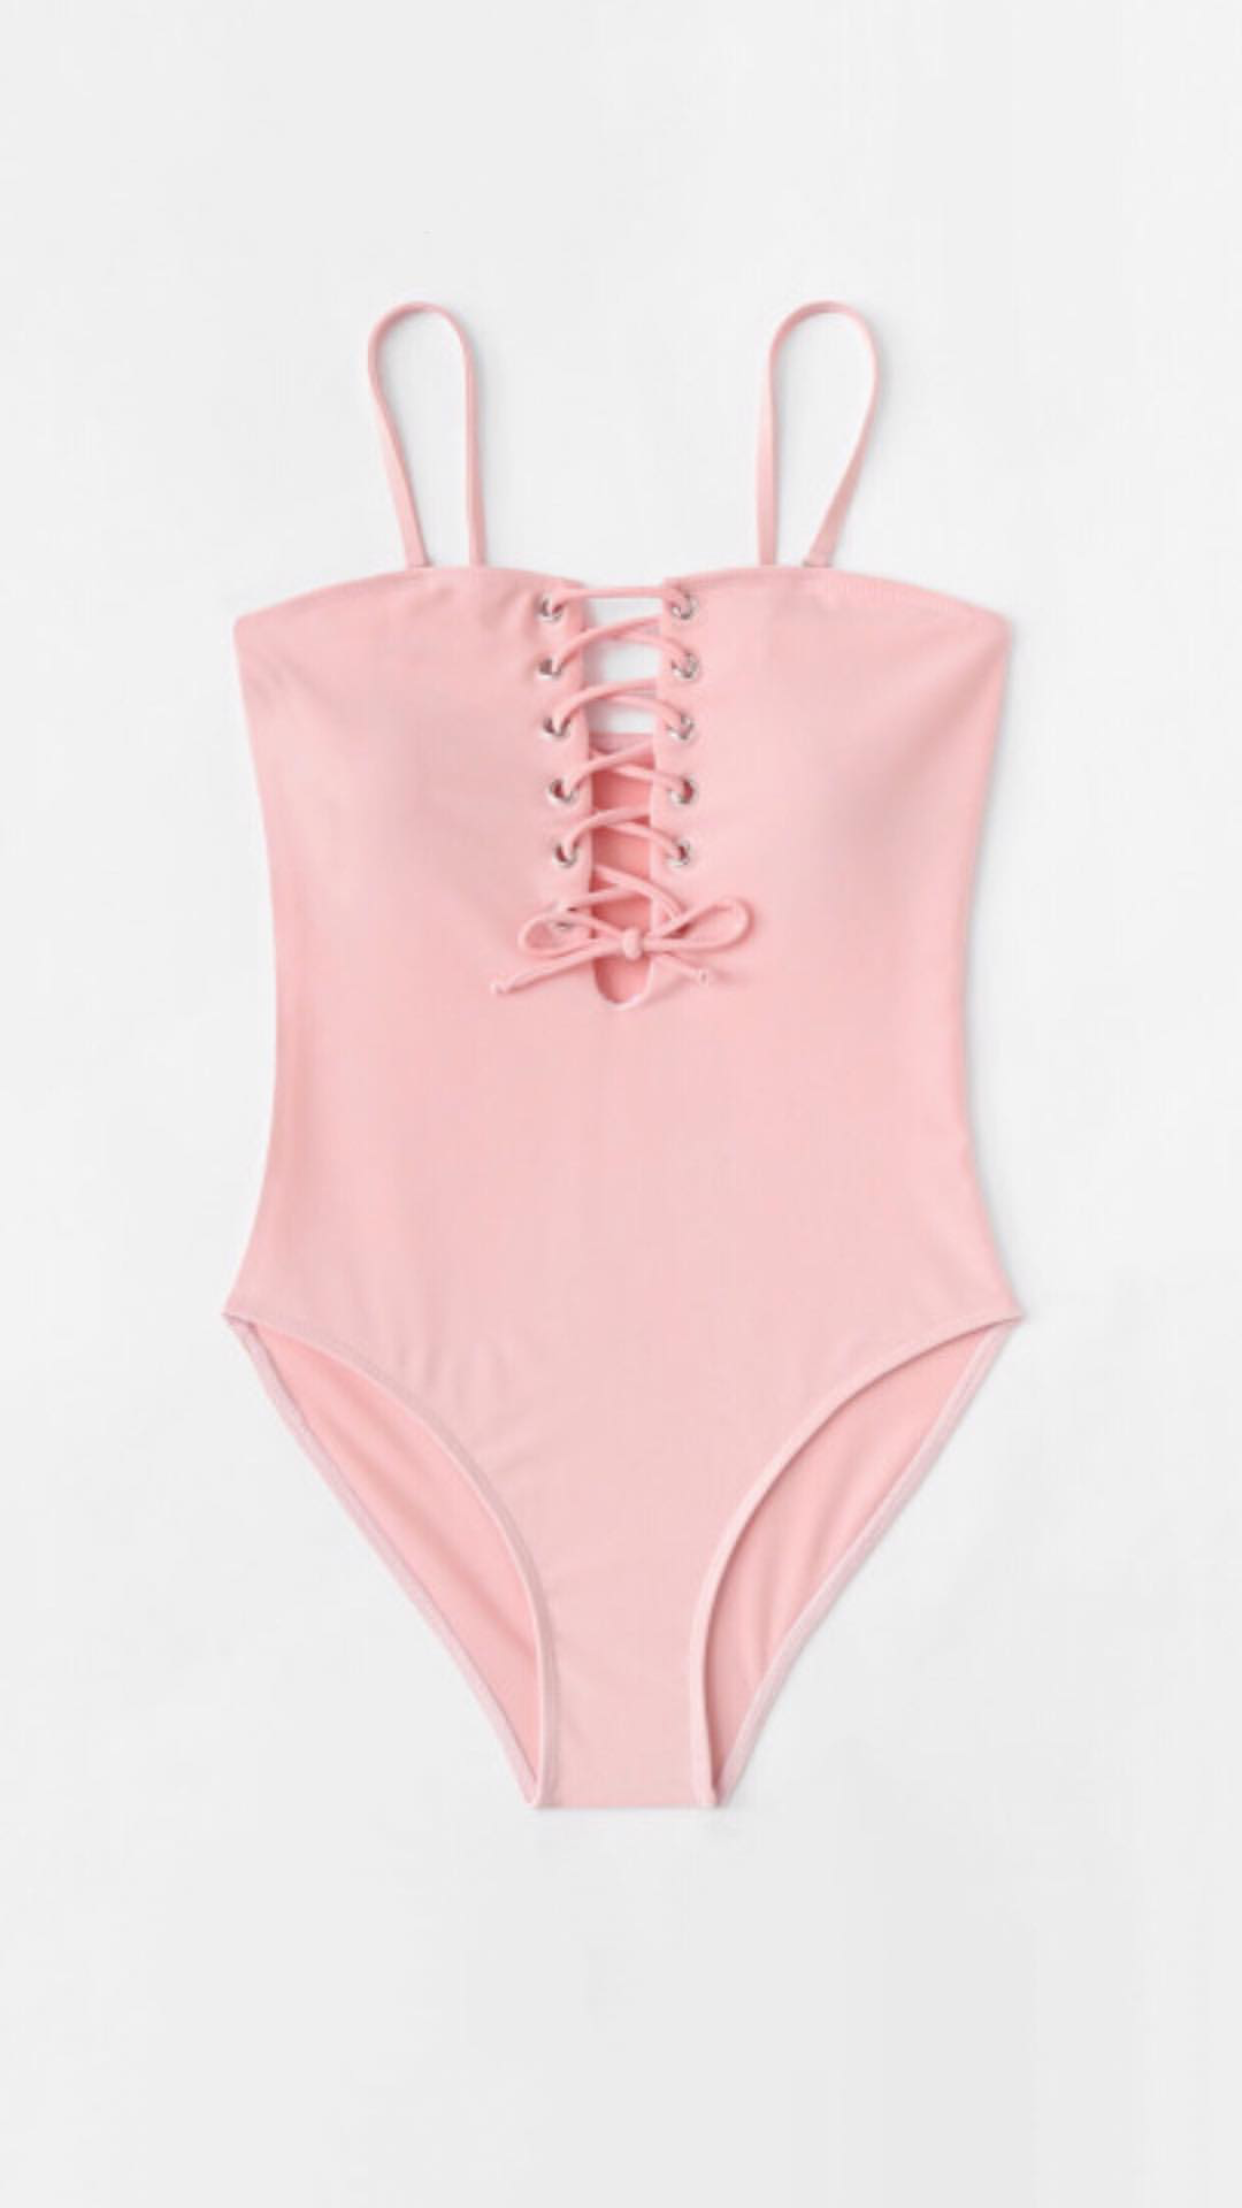 Bañador rosa pastel